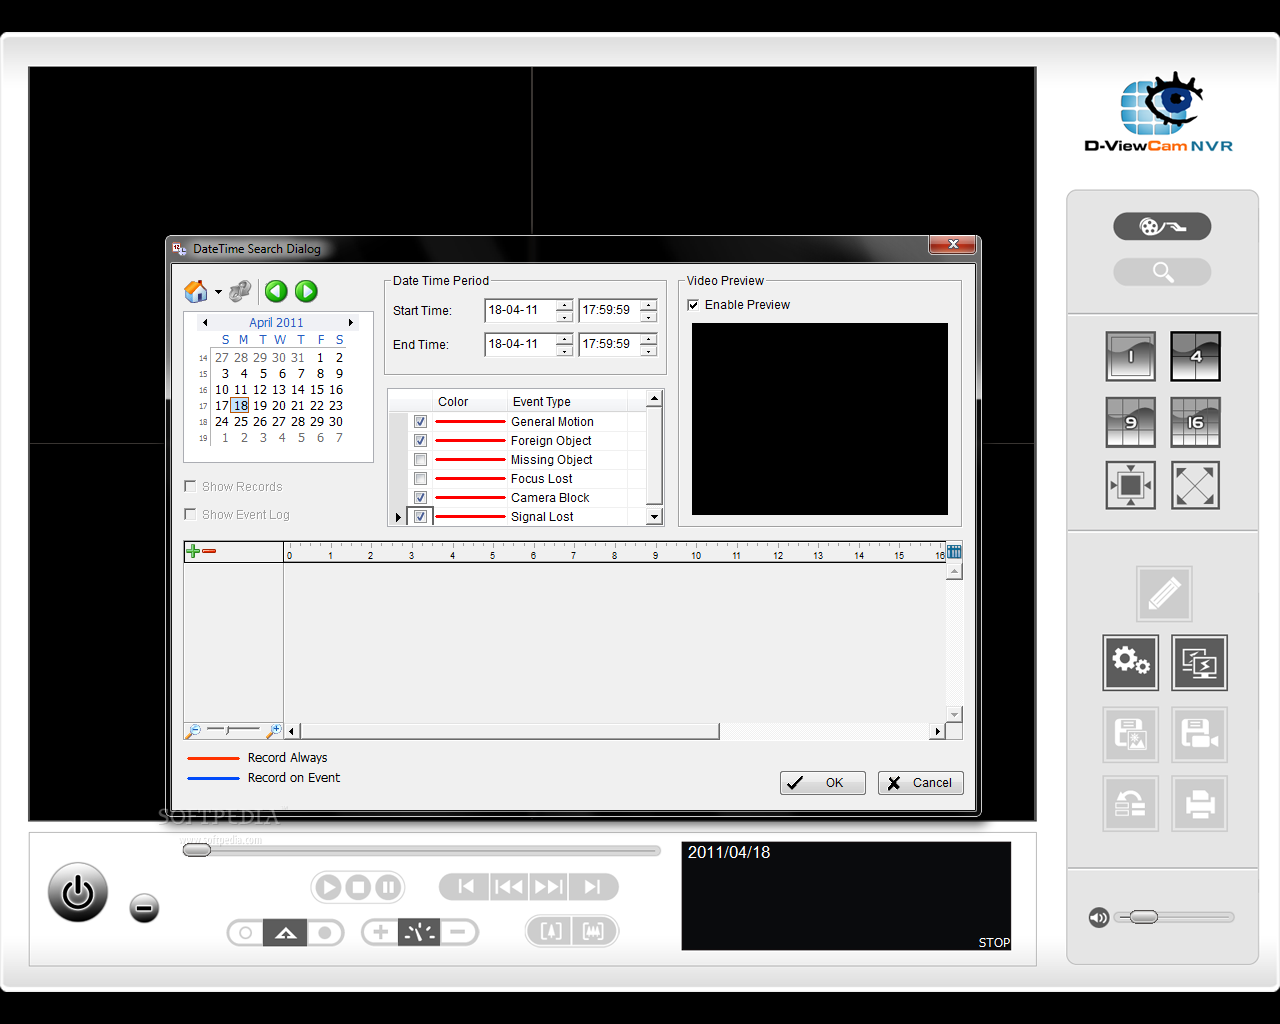 D-link viewcam software download mac